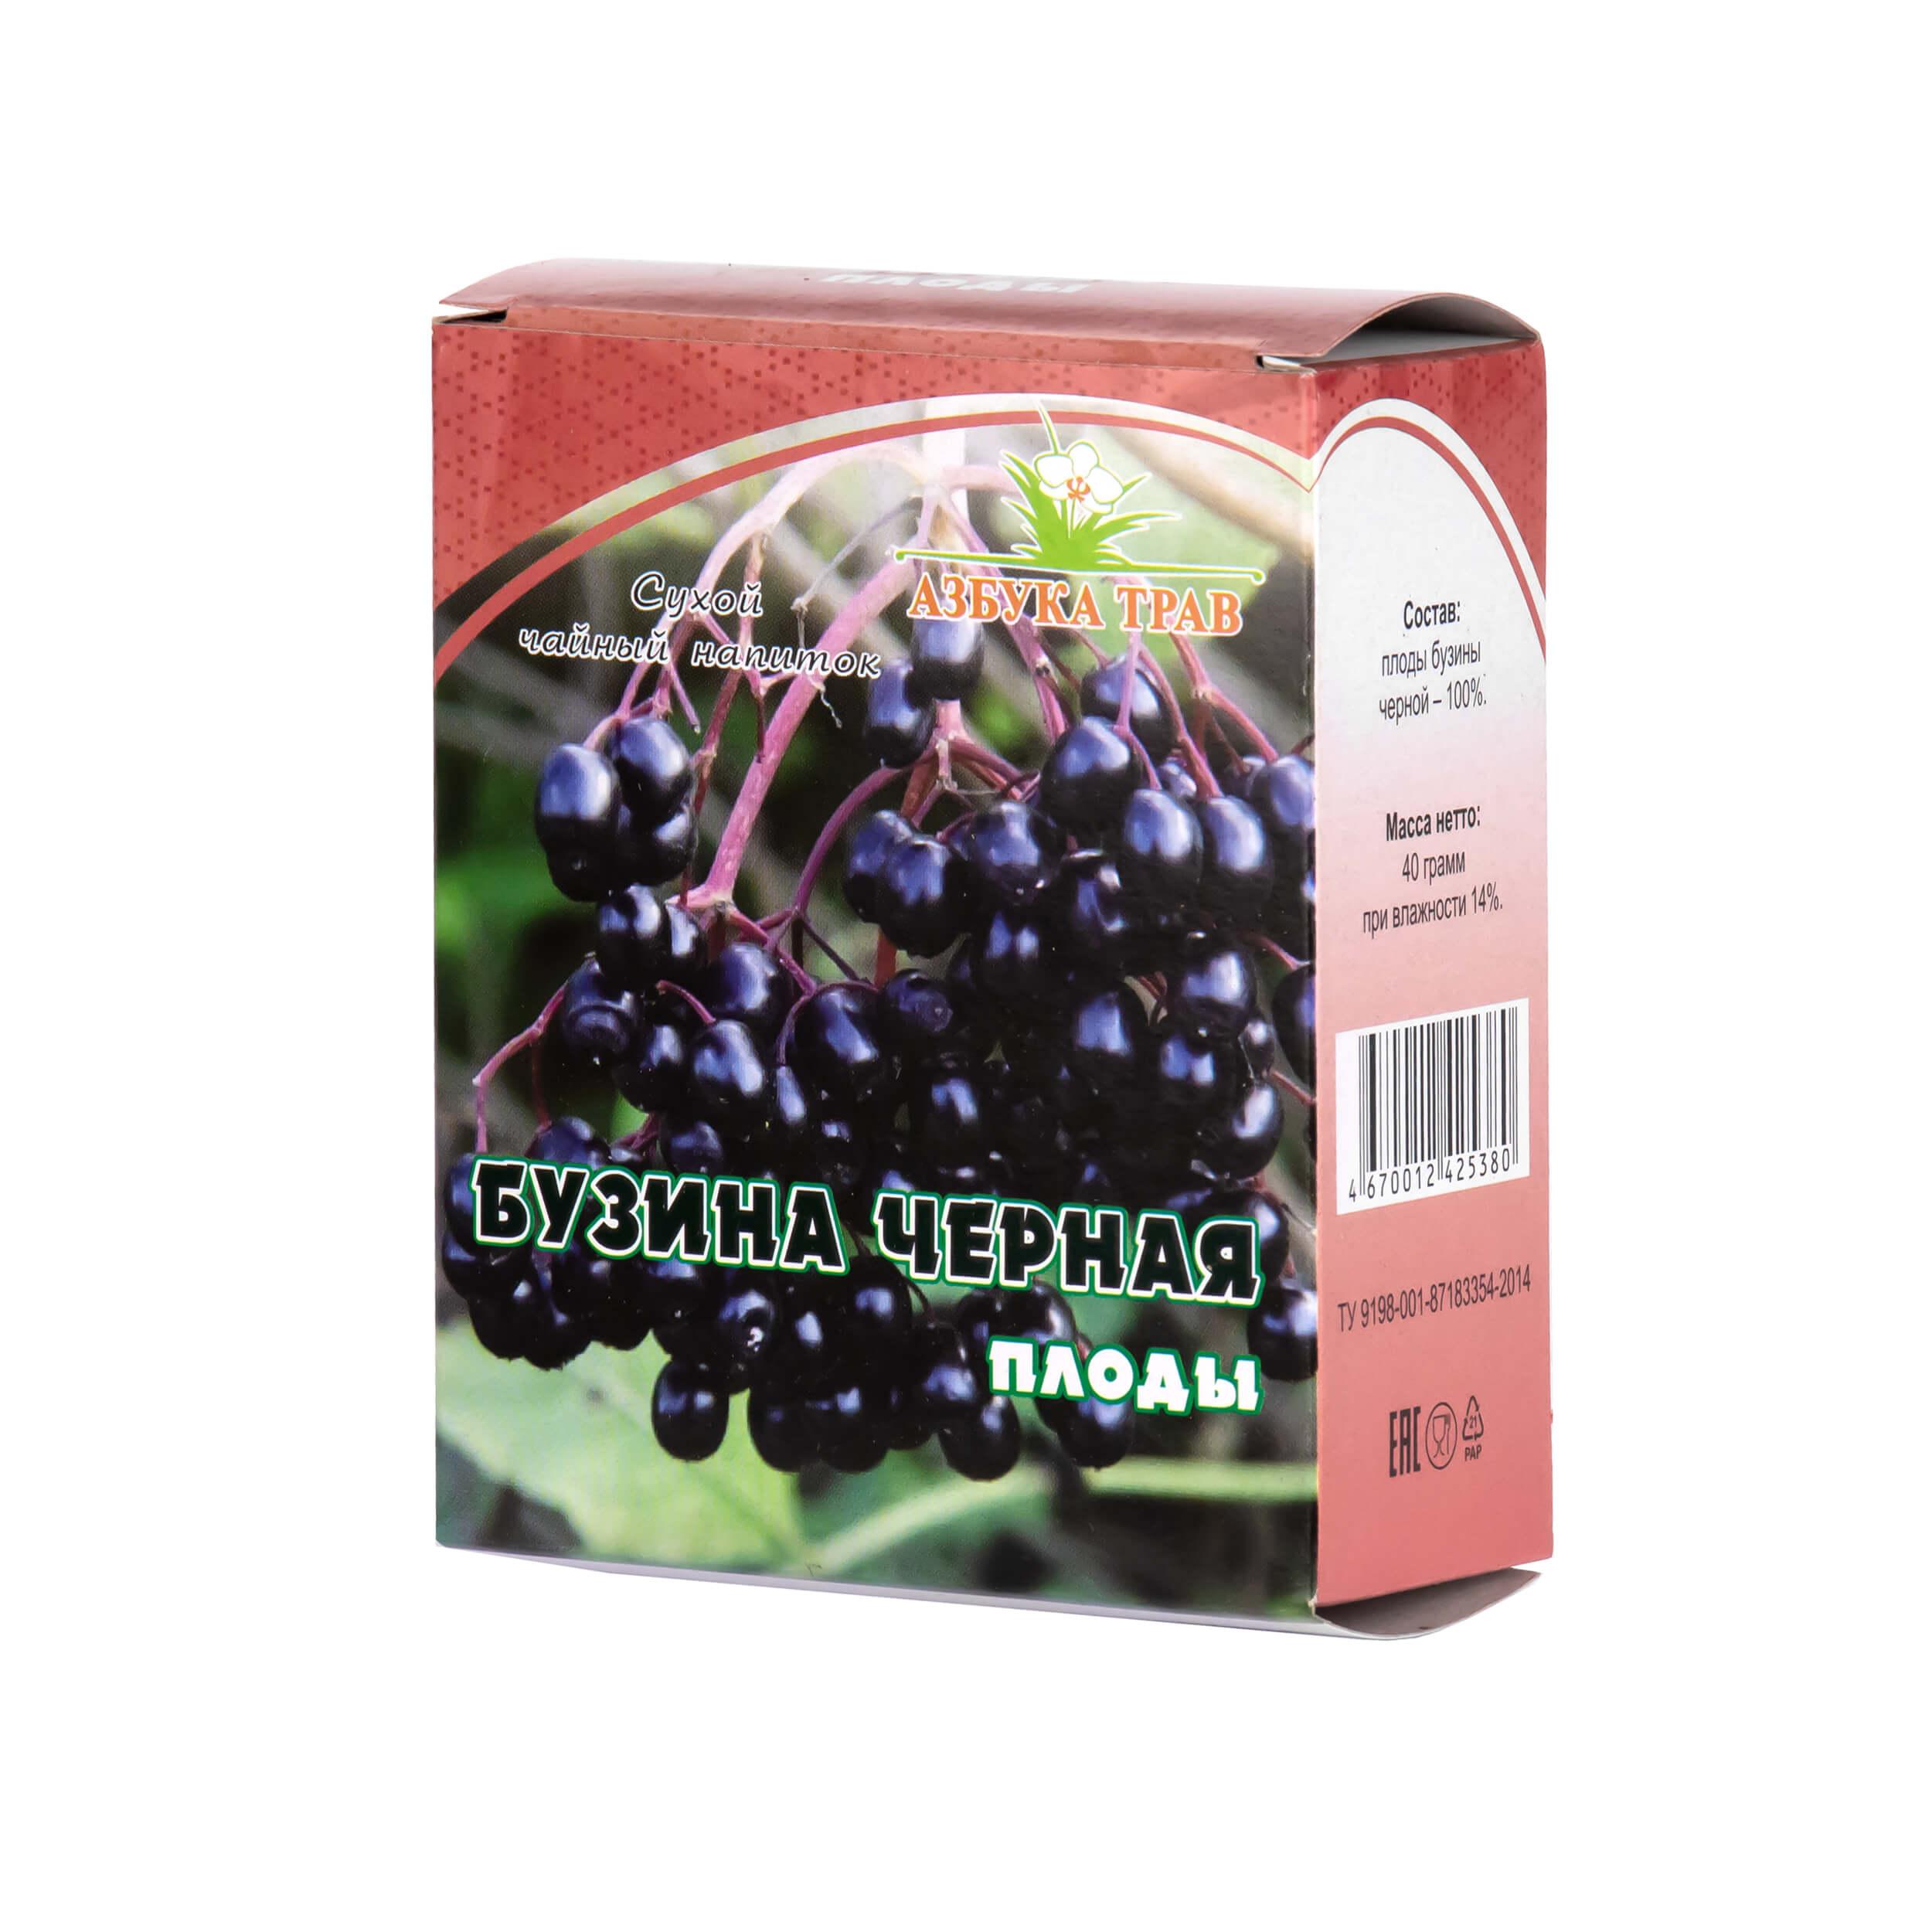 Бузина черная (плоды, 40 грамм) фото